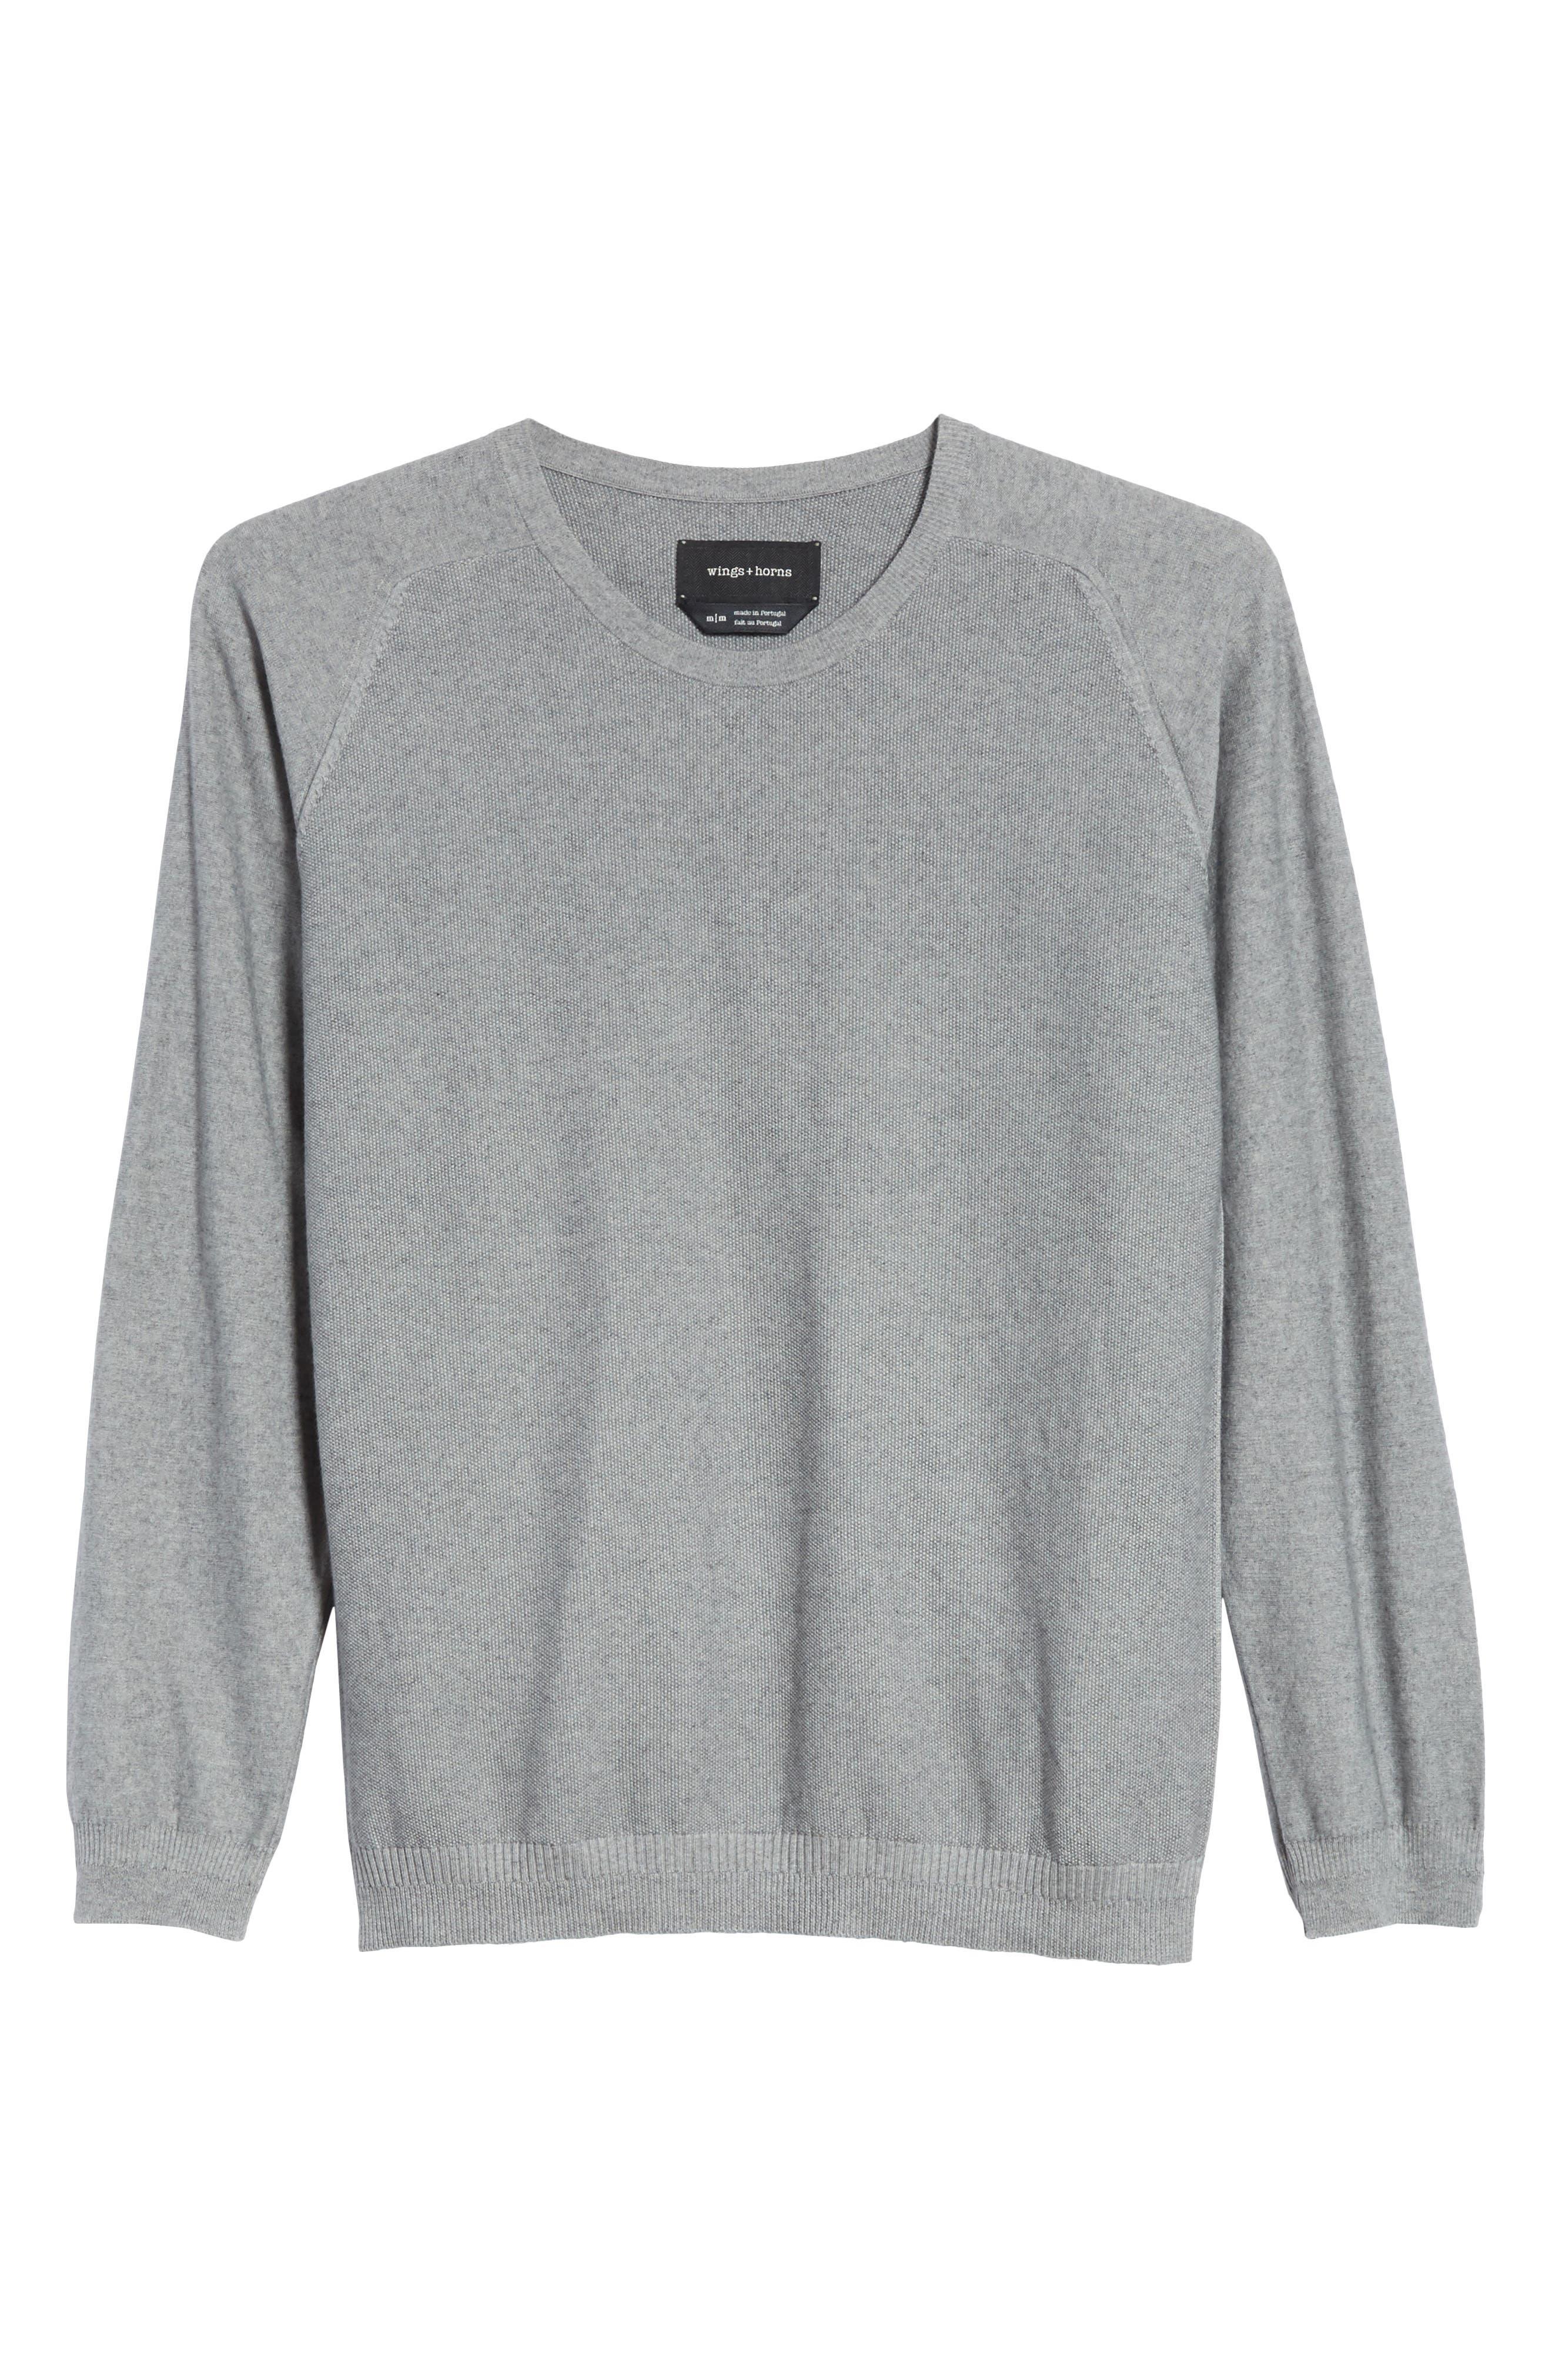 Cotton & Cashmere Sweater,                             Alternate thumbnail 6, color,                             Heather Grey